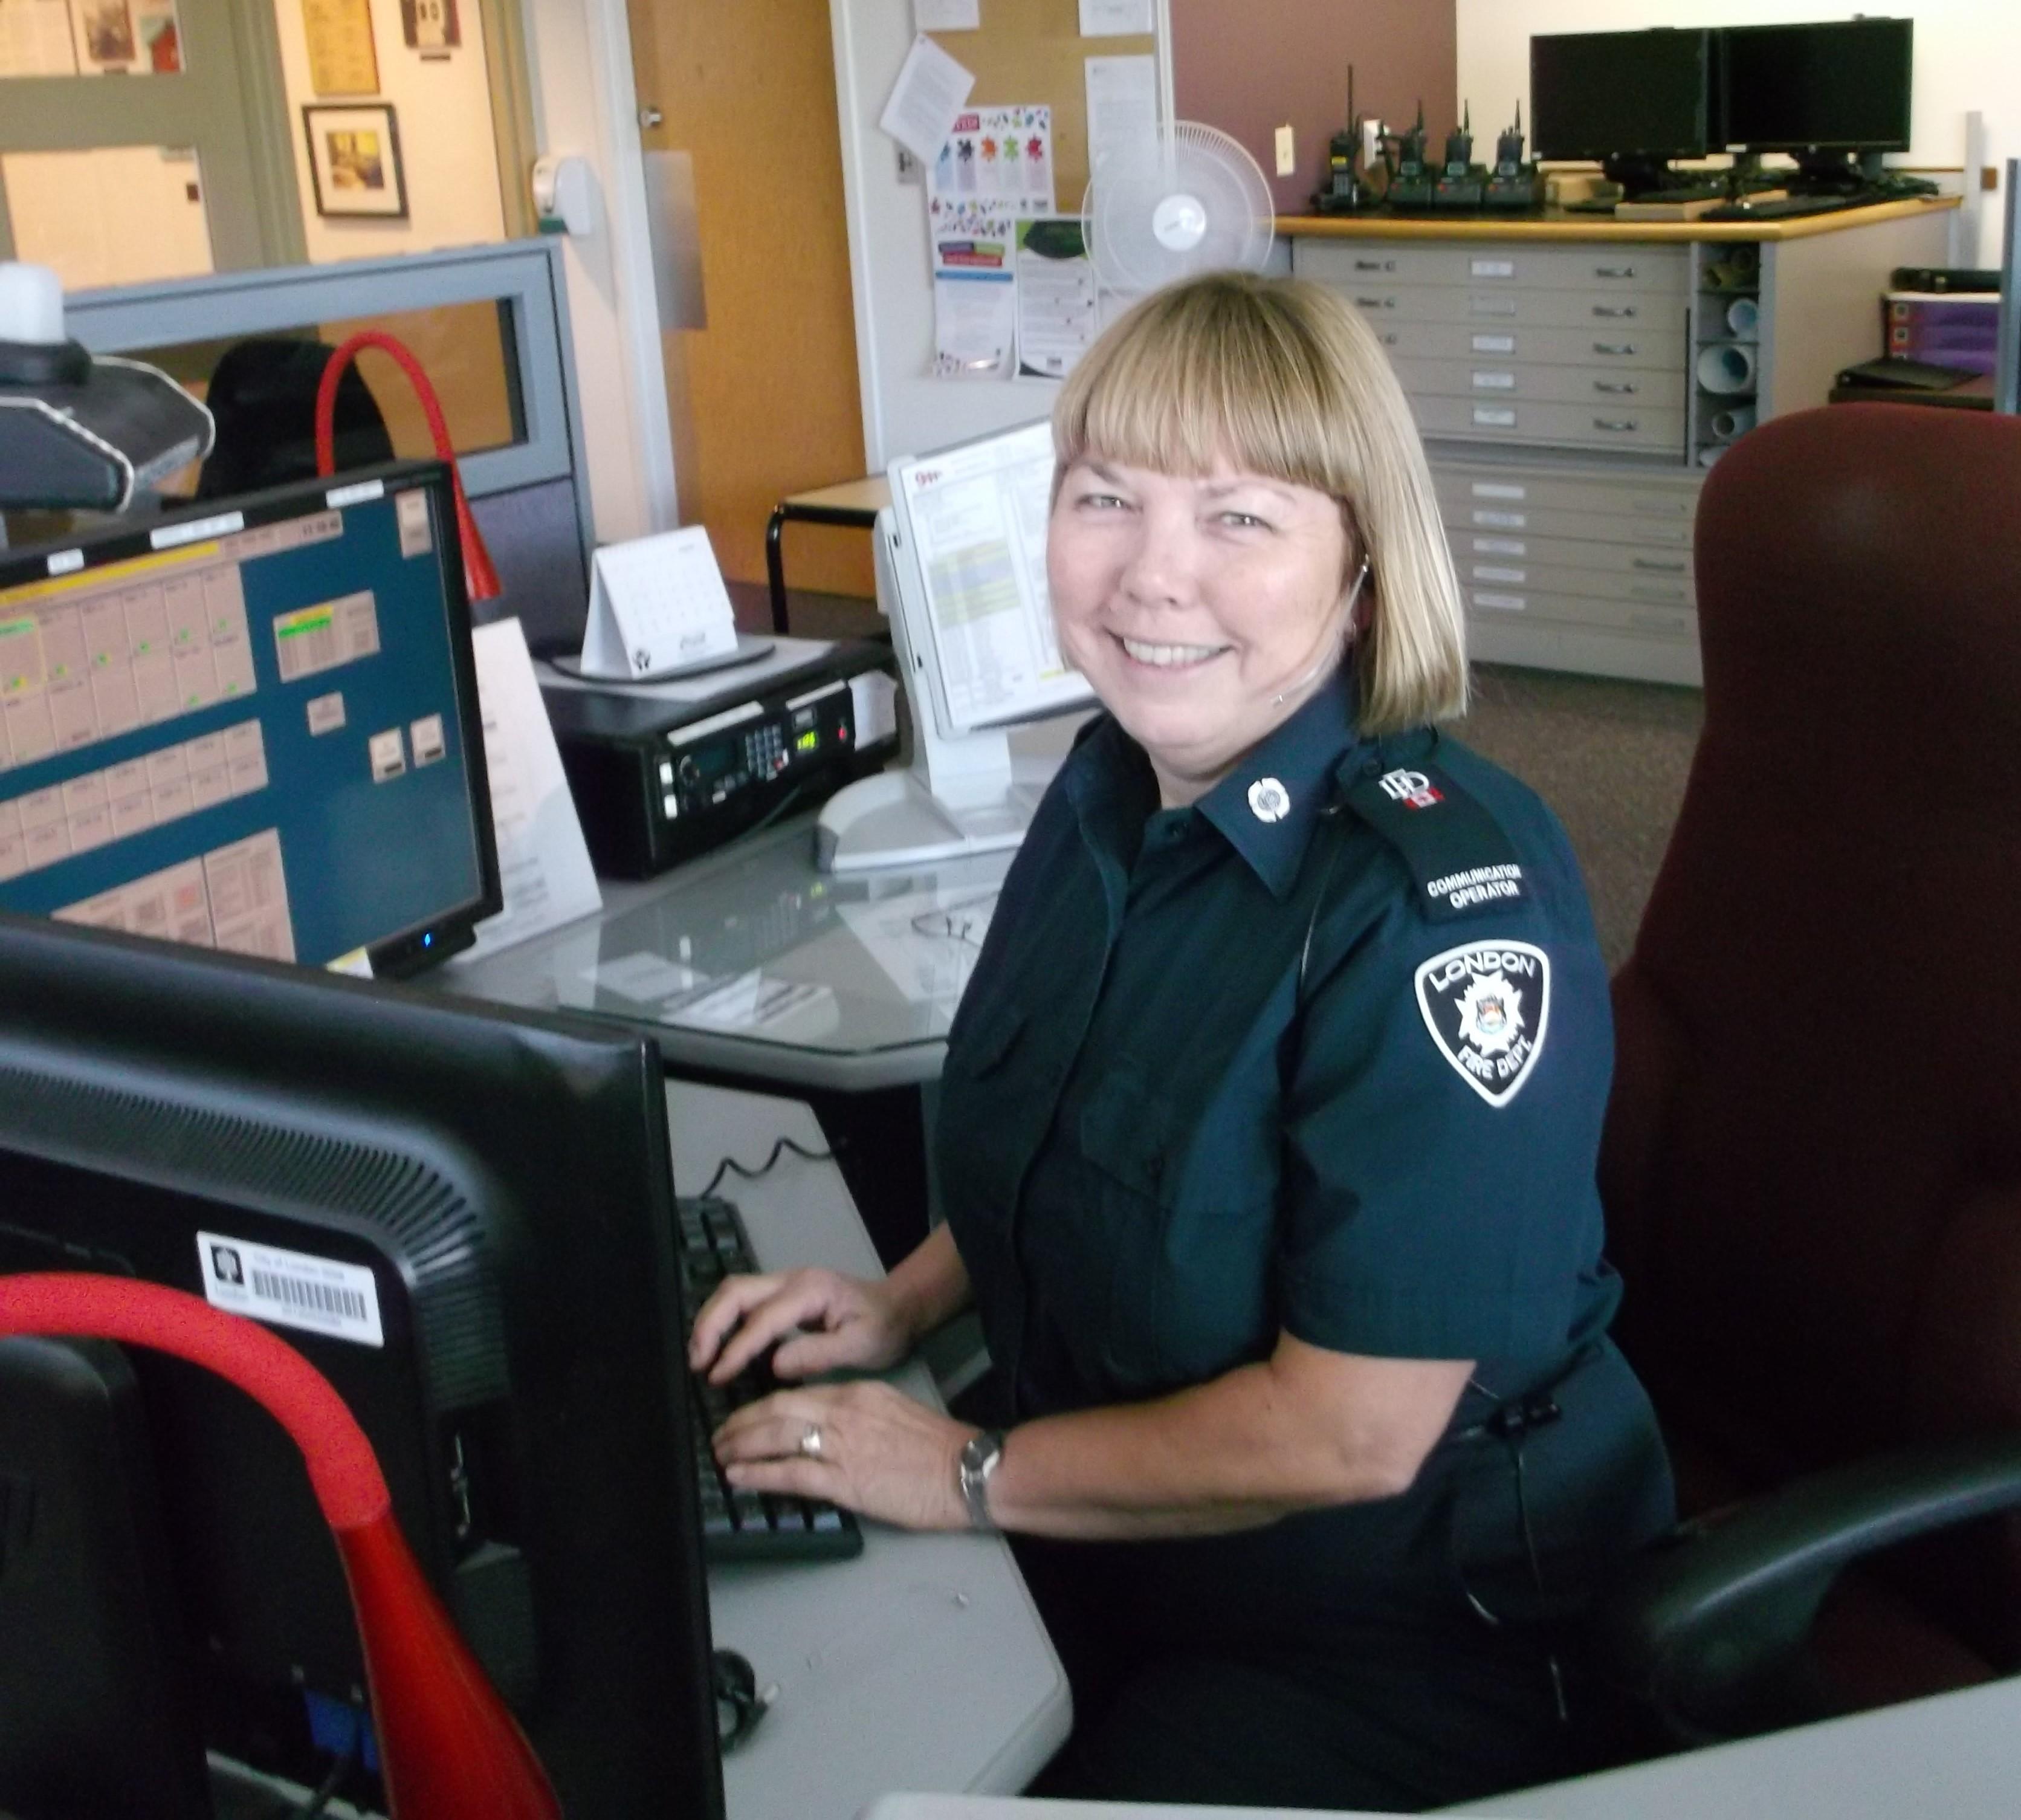 Communications Operator Mary Ann Scherer